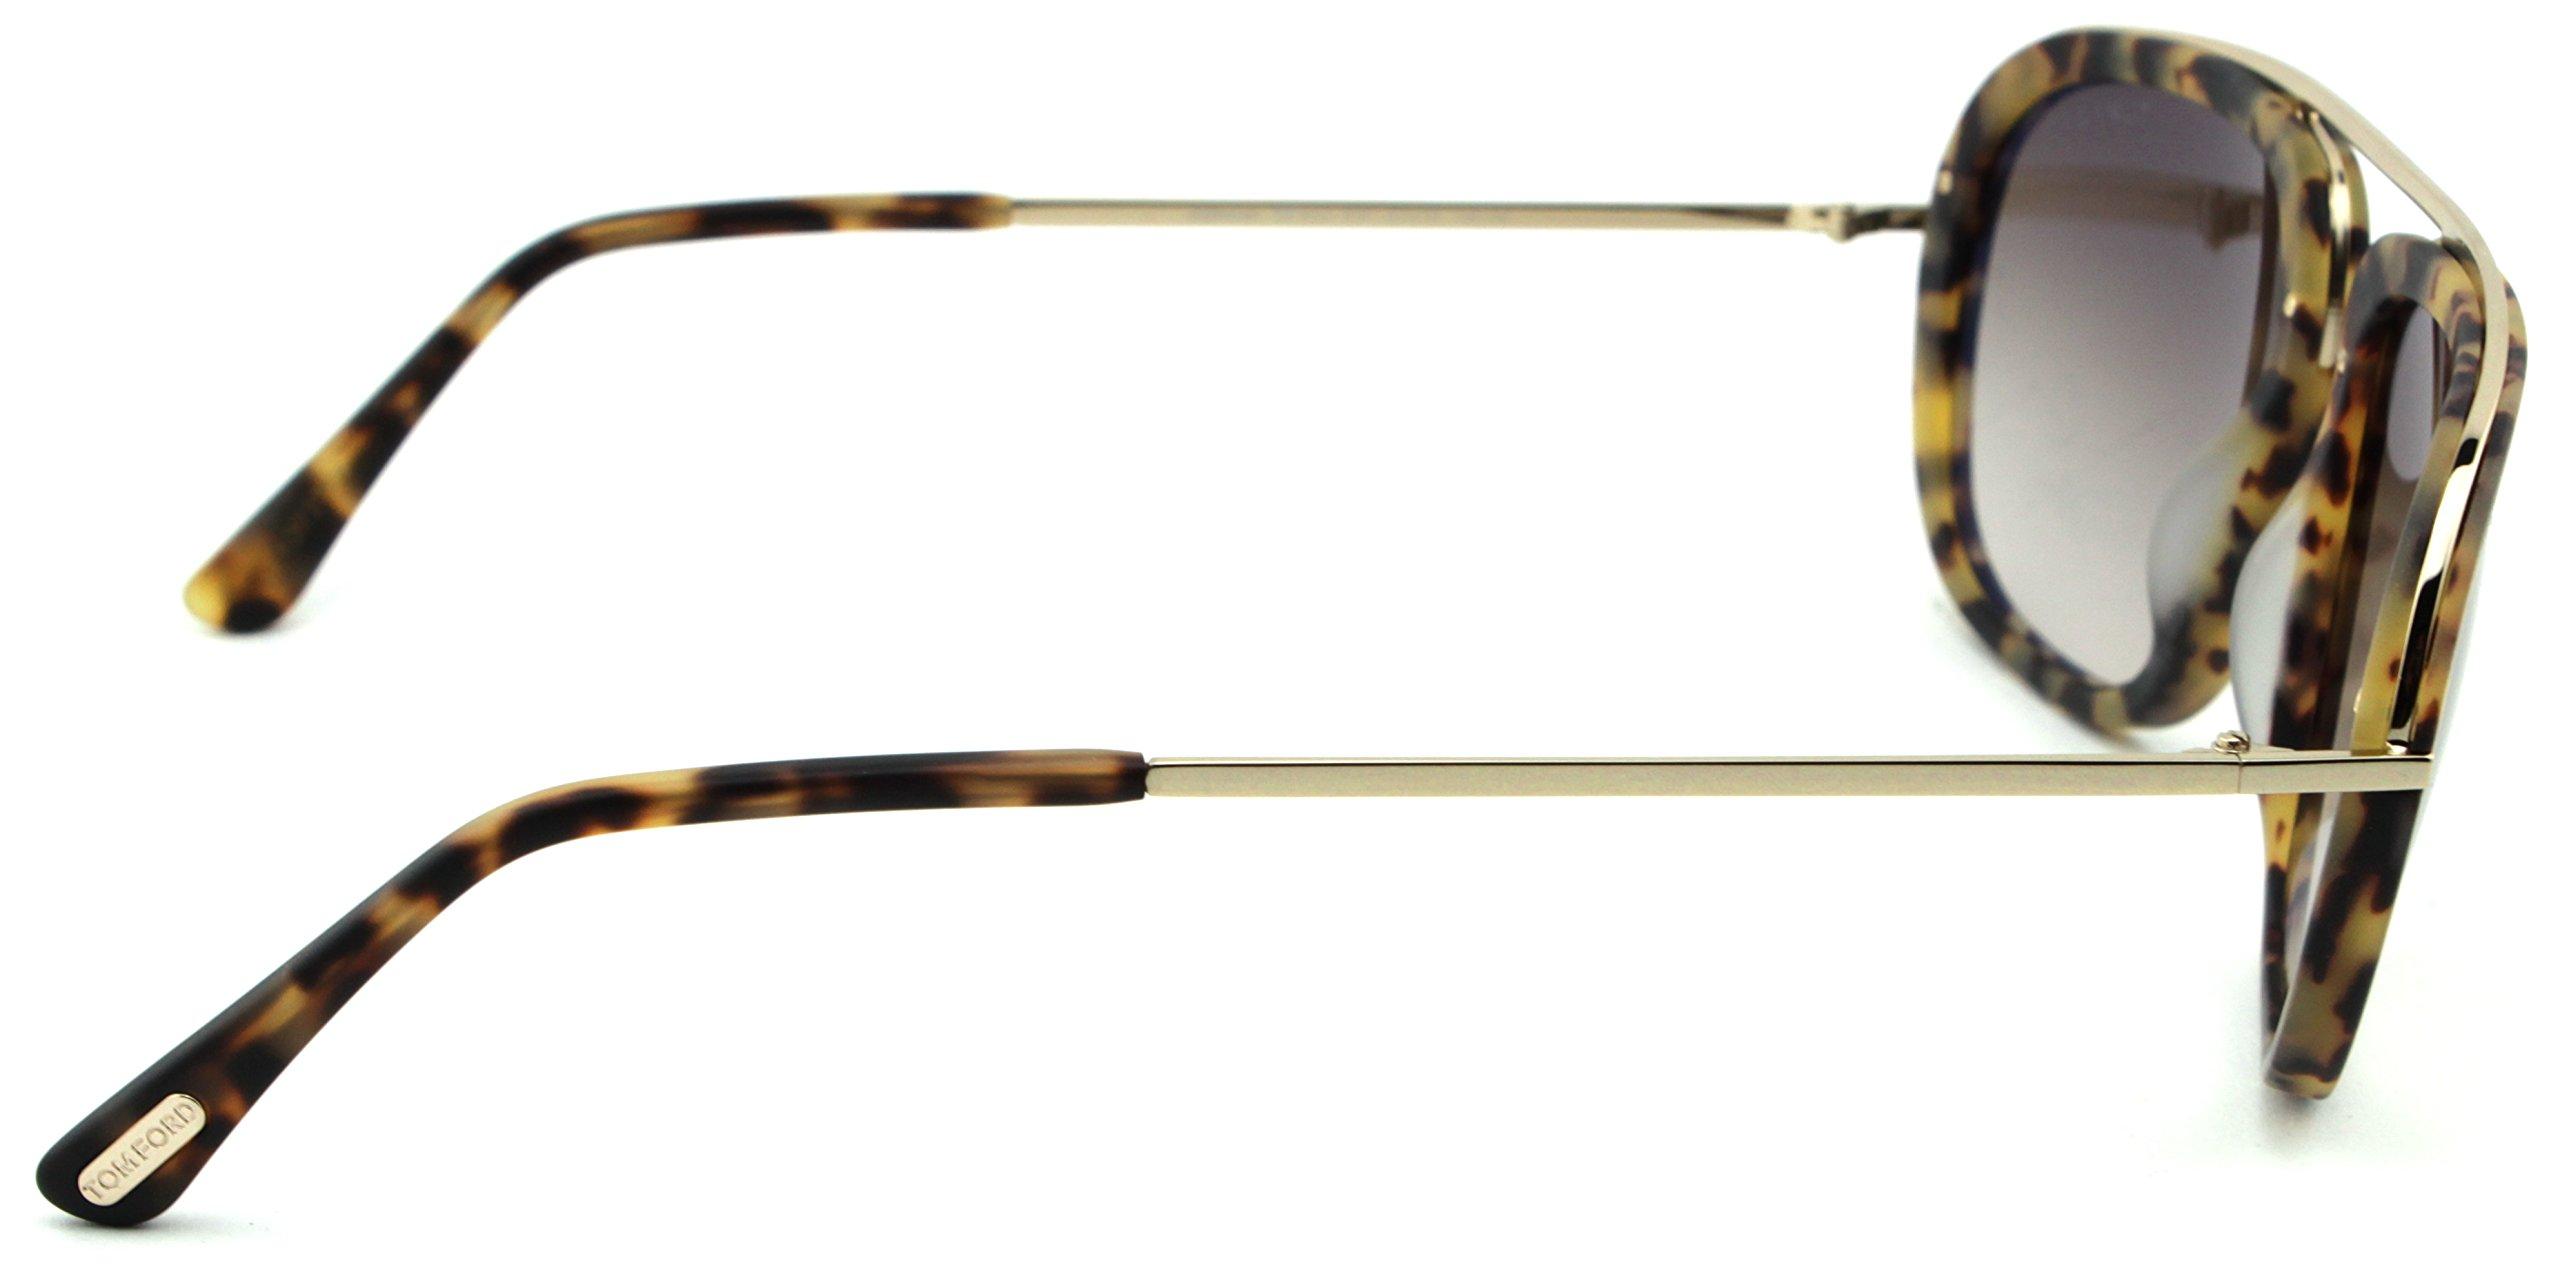 Tom Ford FT 0453 Johnson Unisex Metal Geometric Sunglasses (Blonde Havana Frame, Gradient Brown Lens 53F) by Tom Ford (Image #3)